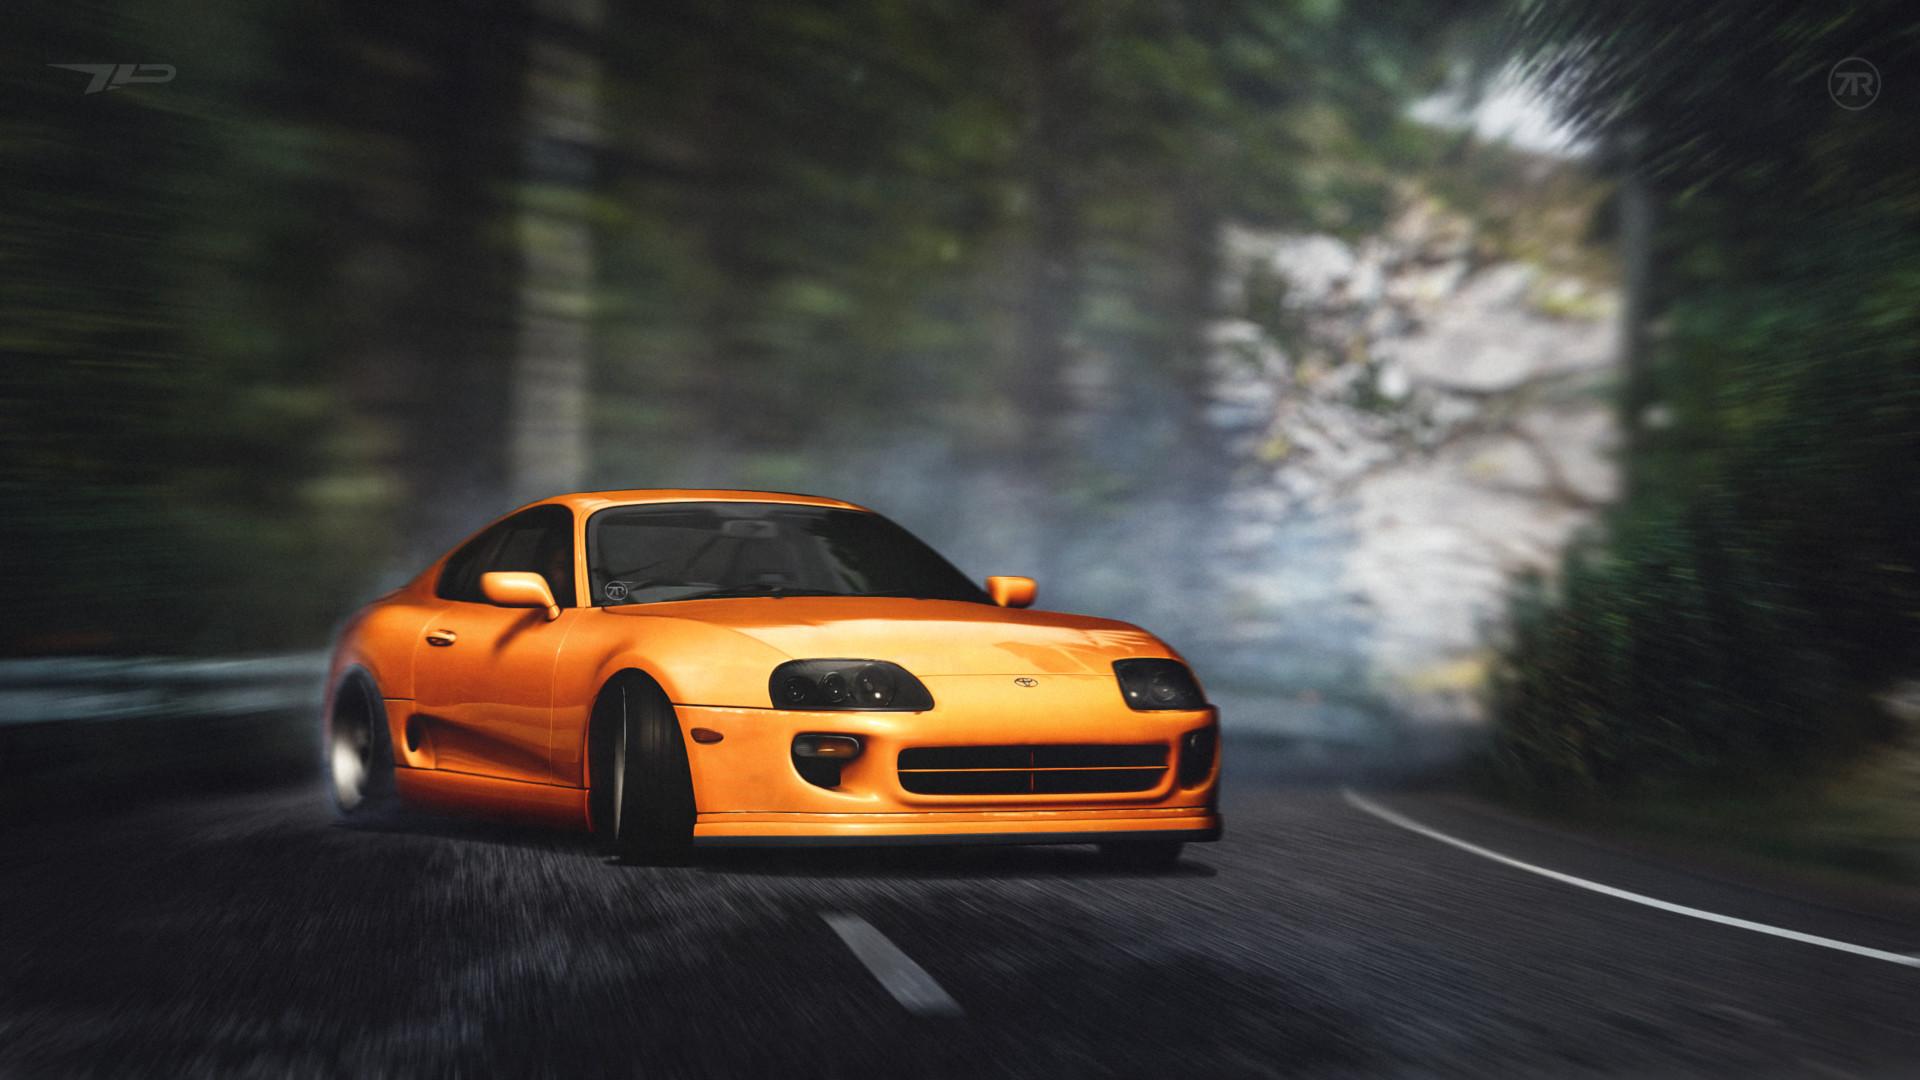 ArtStation - Toyota Supra - Touge Drift, Vladimir Gorbenko